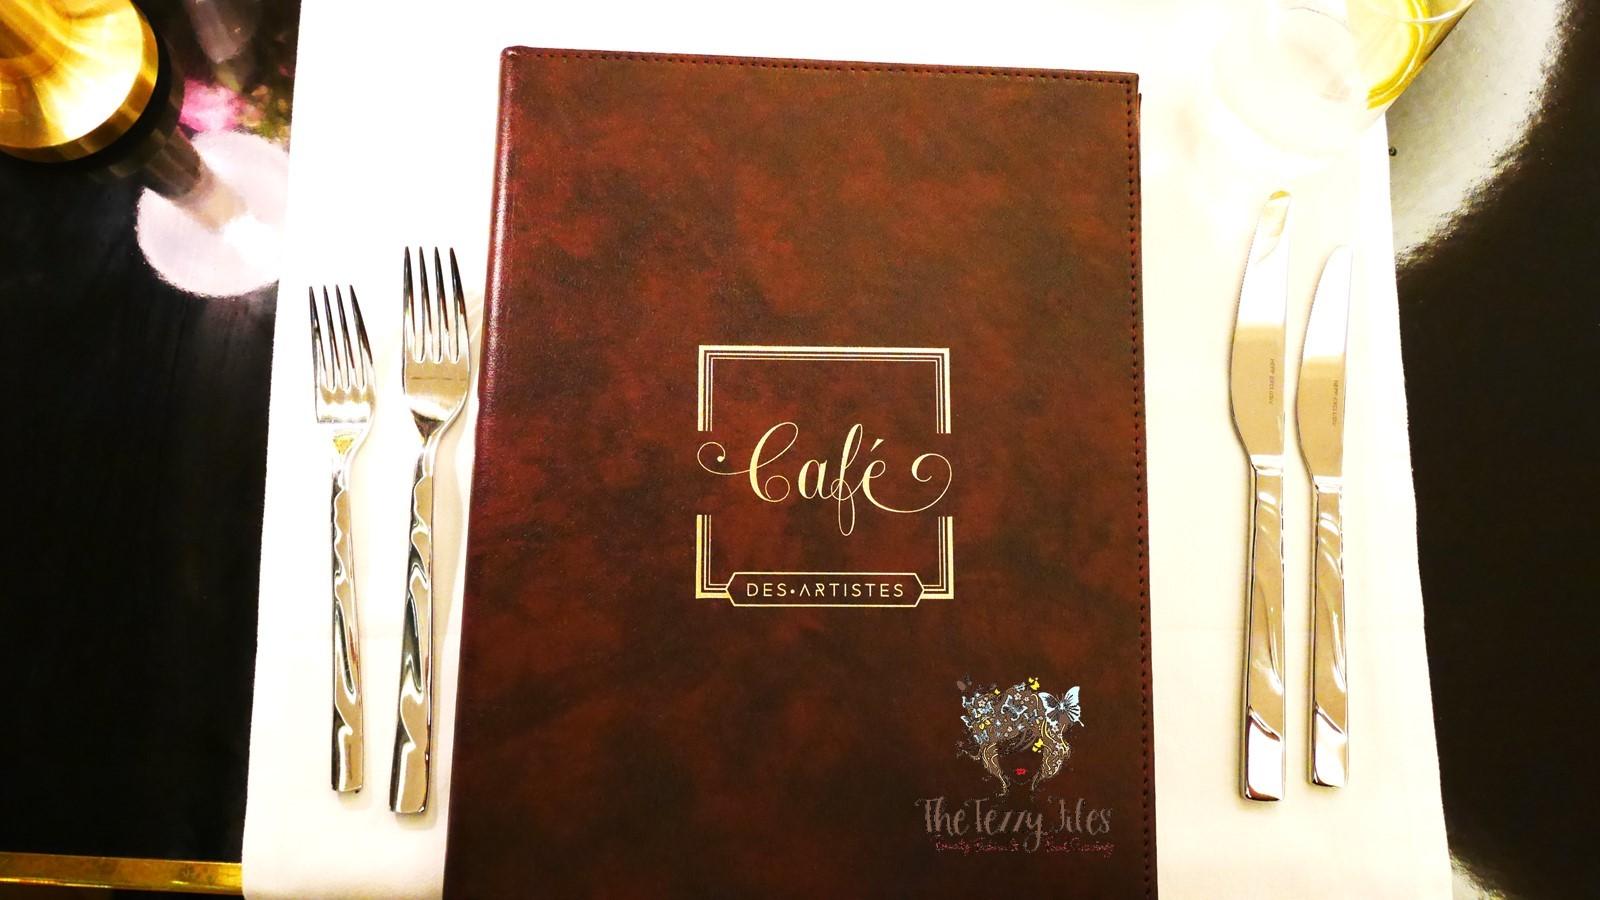 cafe-des-artistes-boxpark-dubai-food-blog-review-the-tezzy-files-dubai-blogger-uae-lifestyle-blog-fine-dining-french-mediterranean-parisian-23